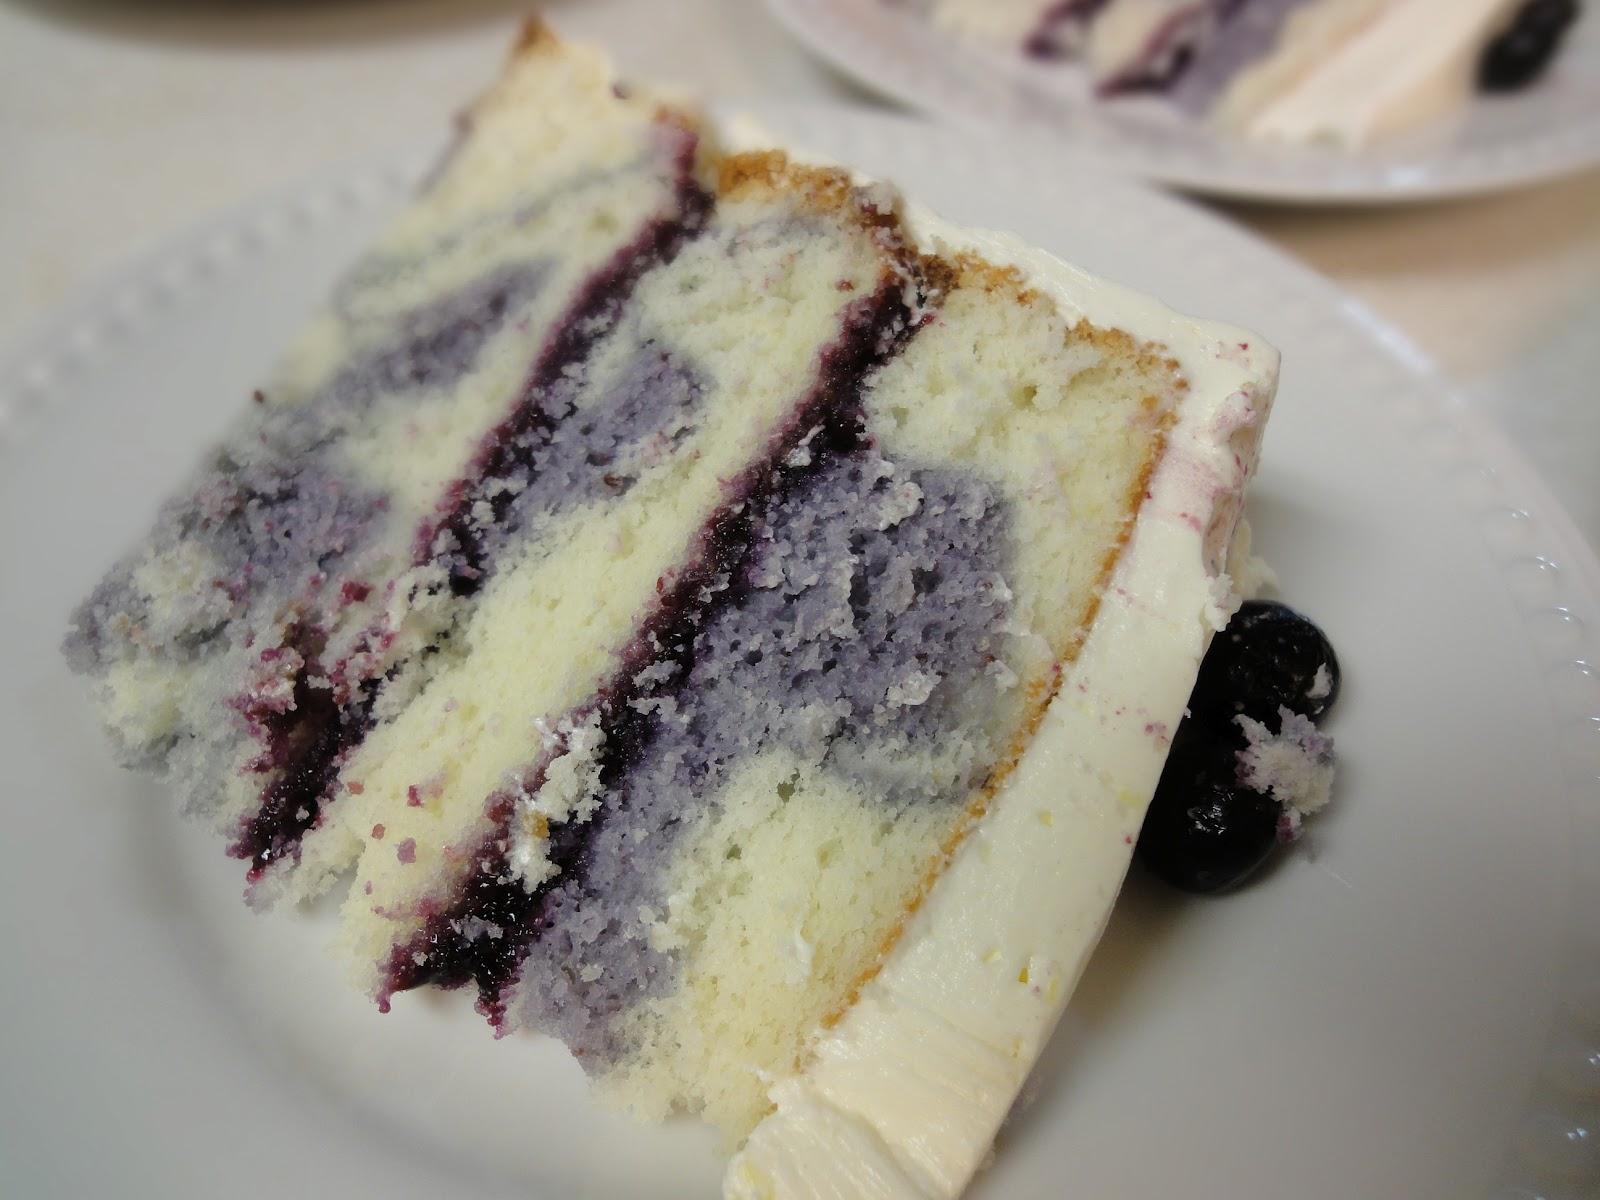 Blog as you Bake: Lemon Blueberry Marble Cake